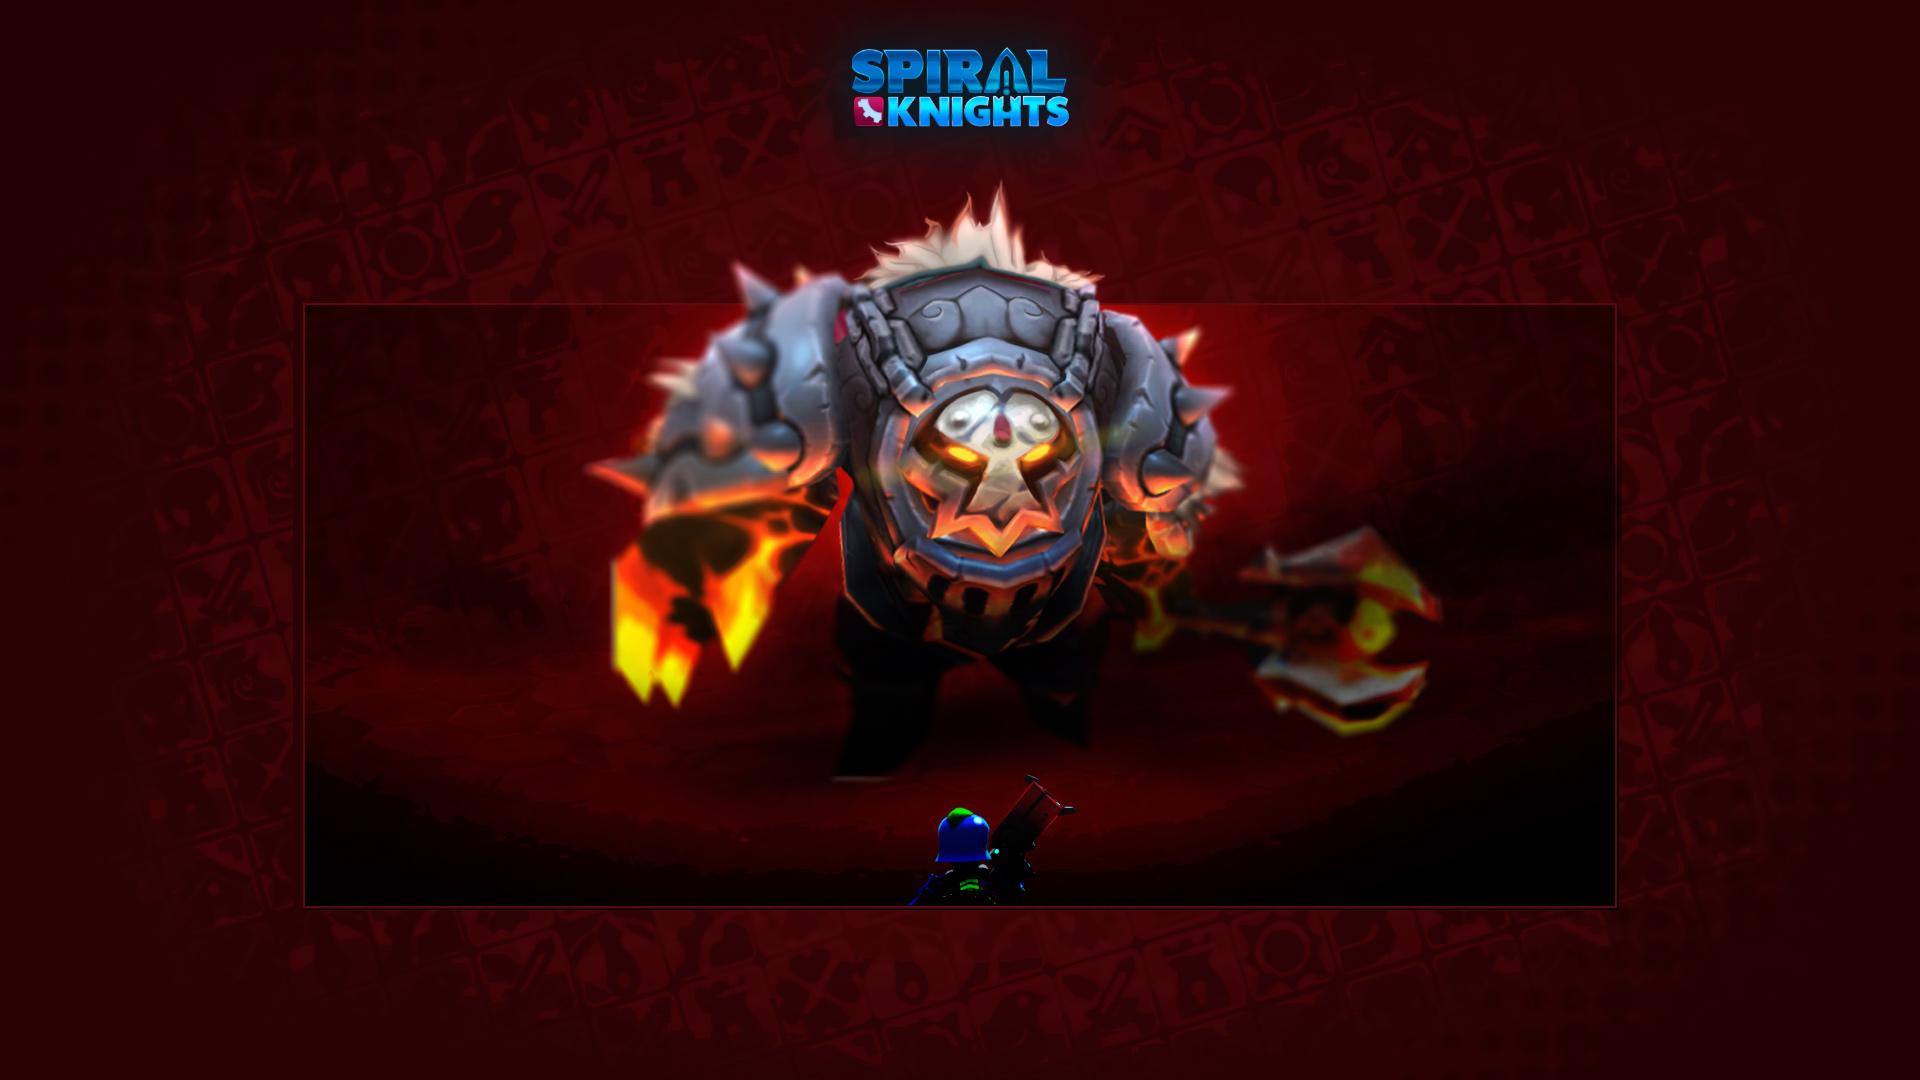 Spiral Knights Spiral Knight For Super Smash Bros 3ds